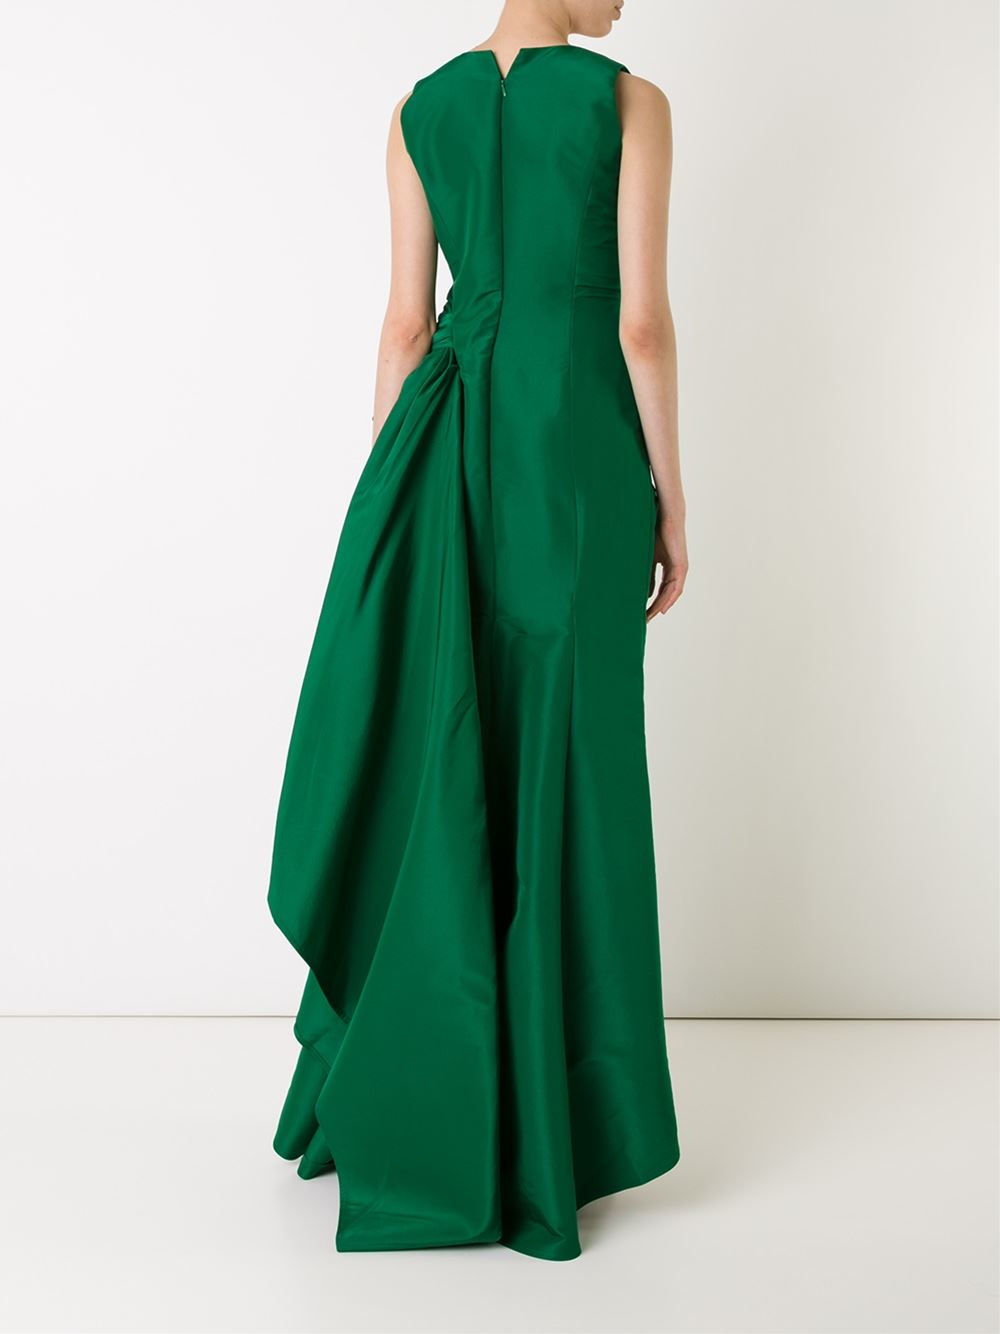 Lyst - Carolina Herrera Draped Evening Dress in Green